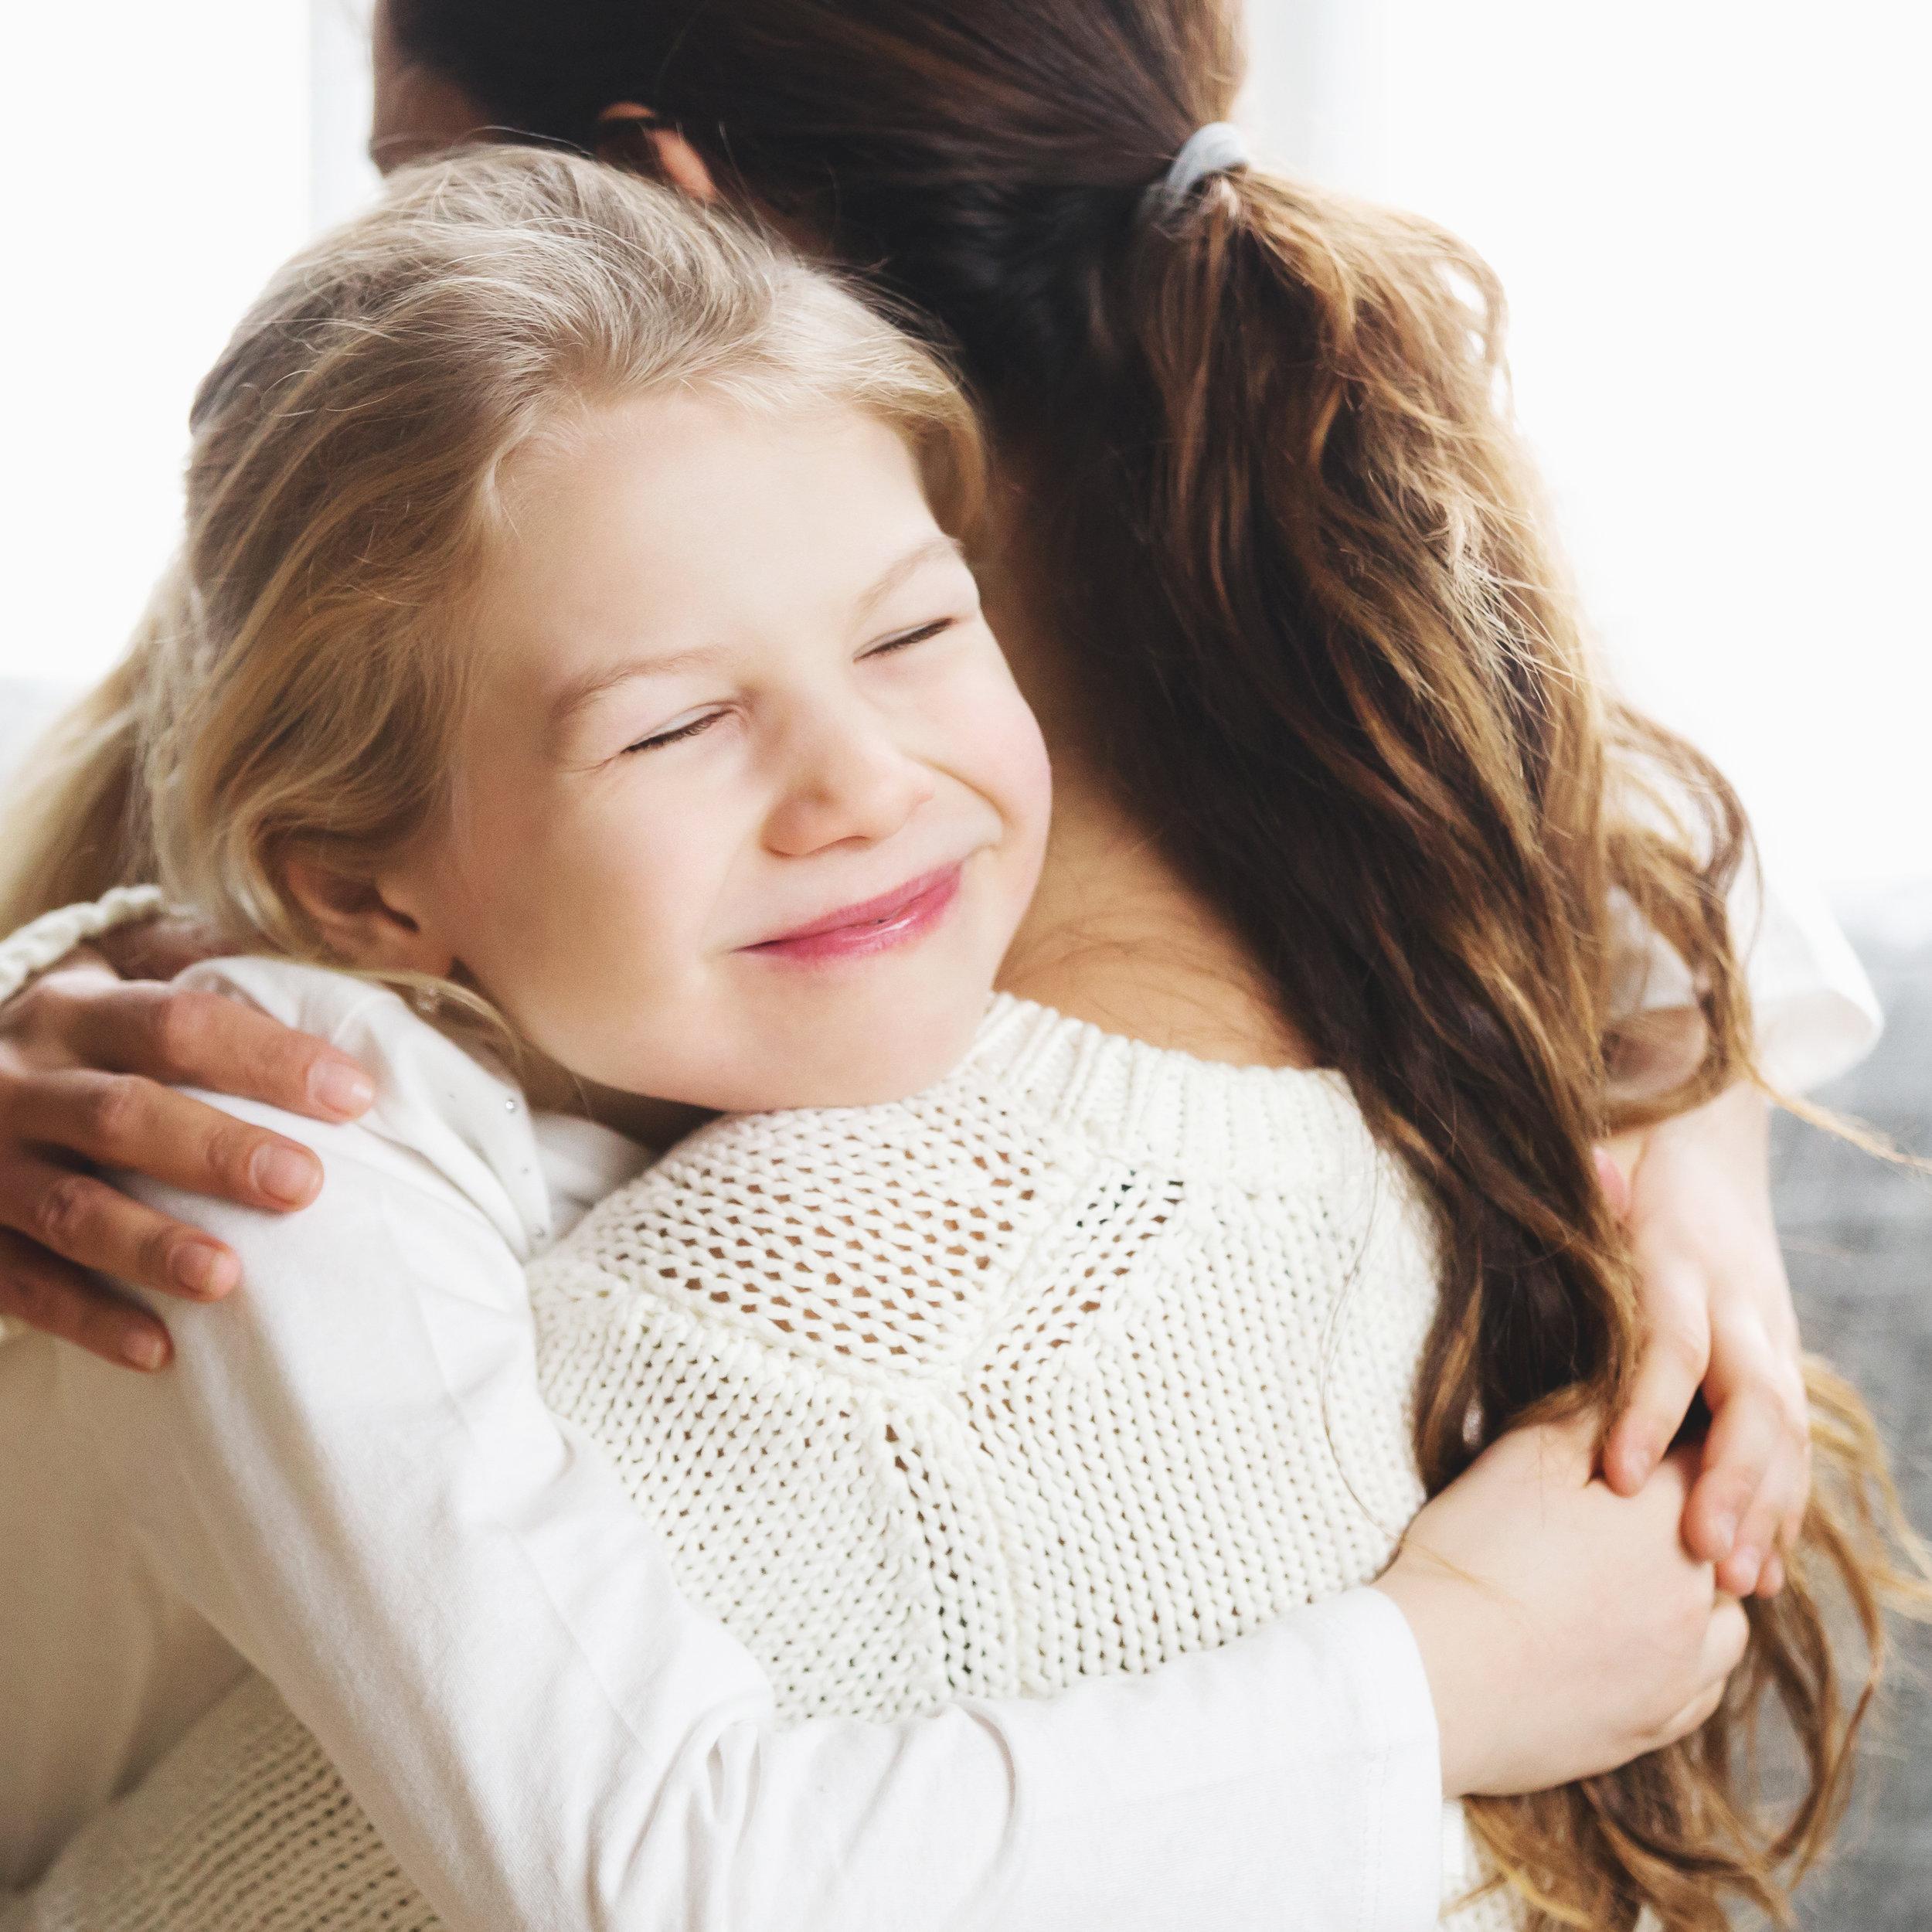 bigstock-Cute-Little-Daughter-Hugging-M-235958128.jpg